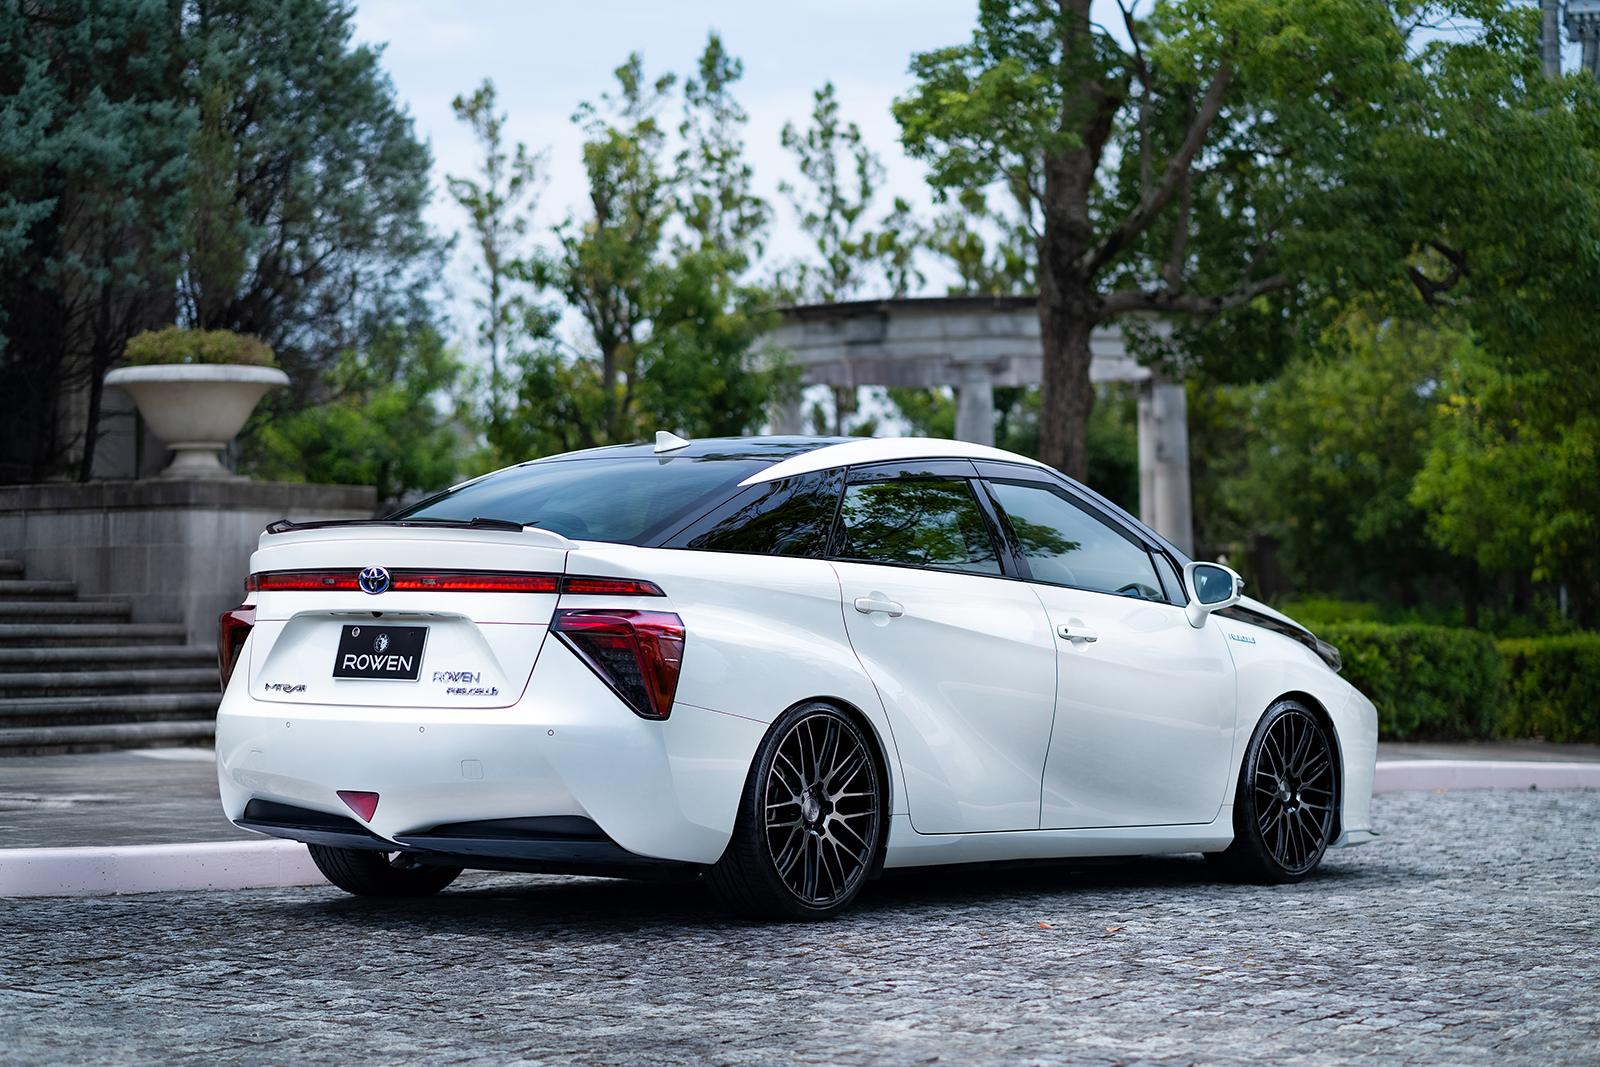 Rowen body kit for Toyota MIRAI JPD10 carbon